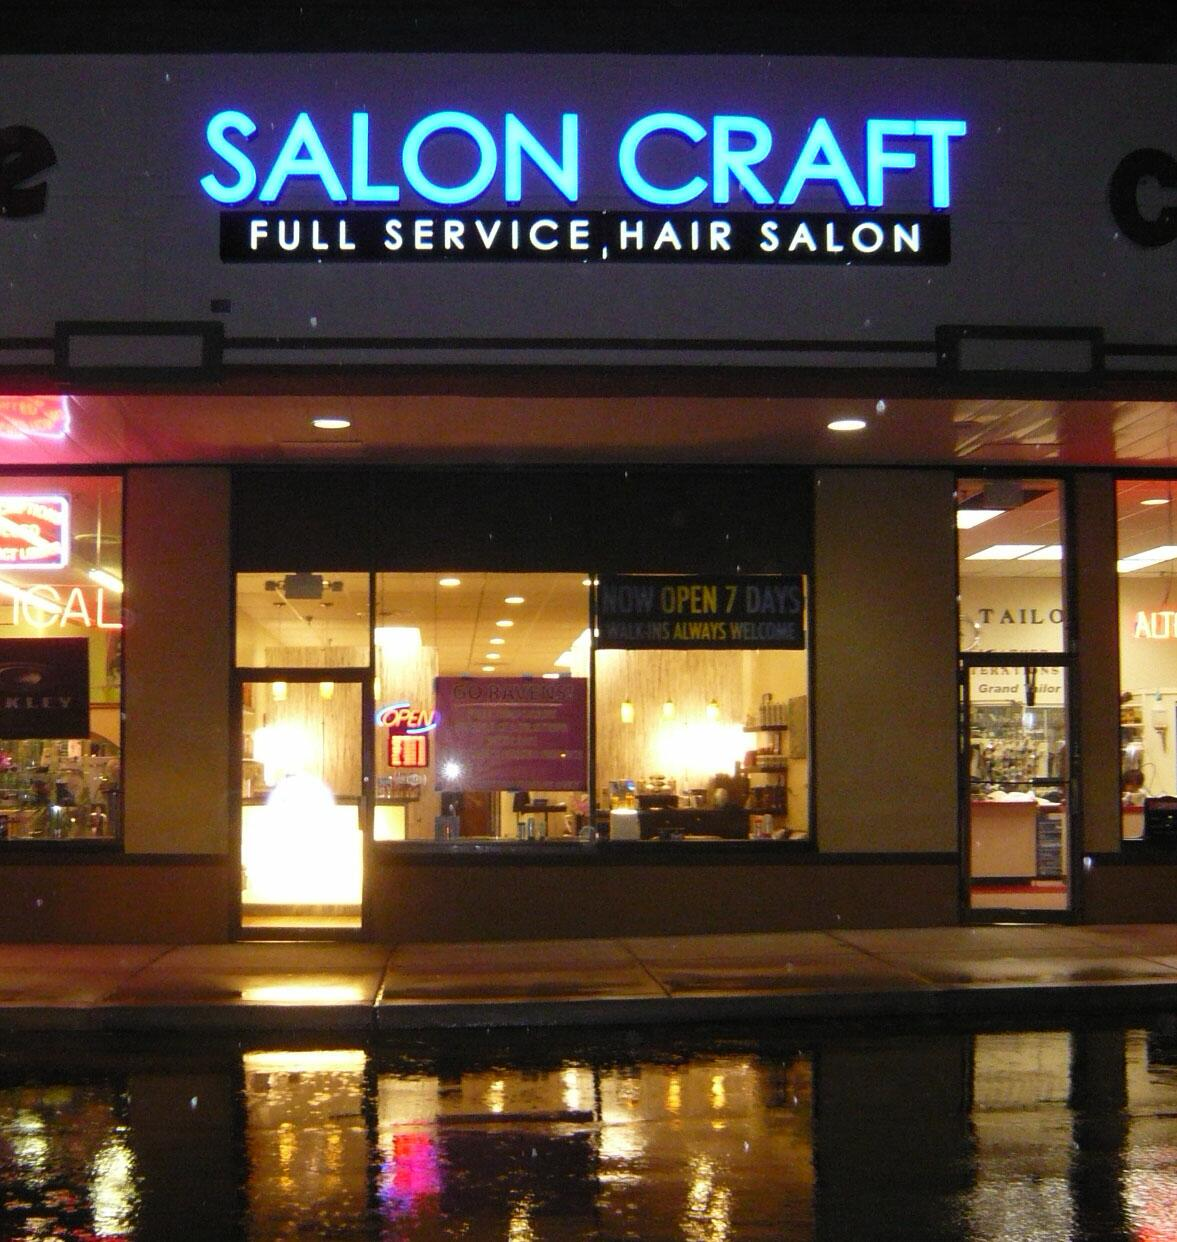 Lutherville Timonium Salon Craft Hair Salon Implements